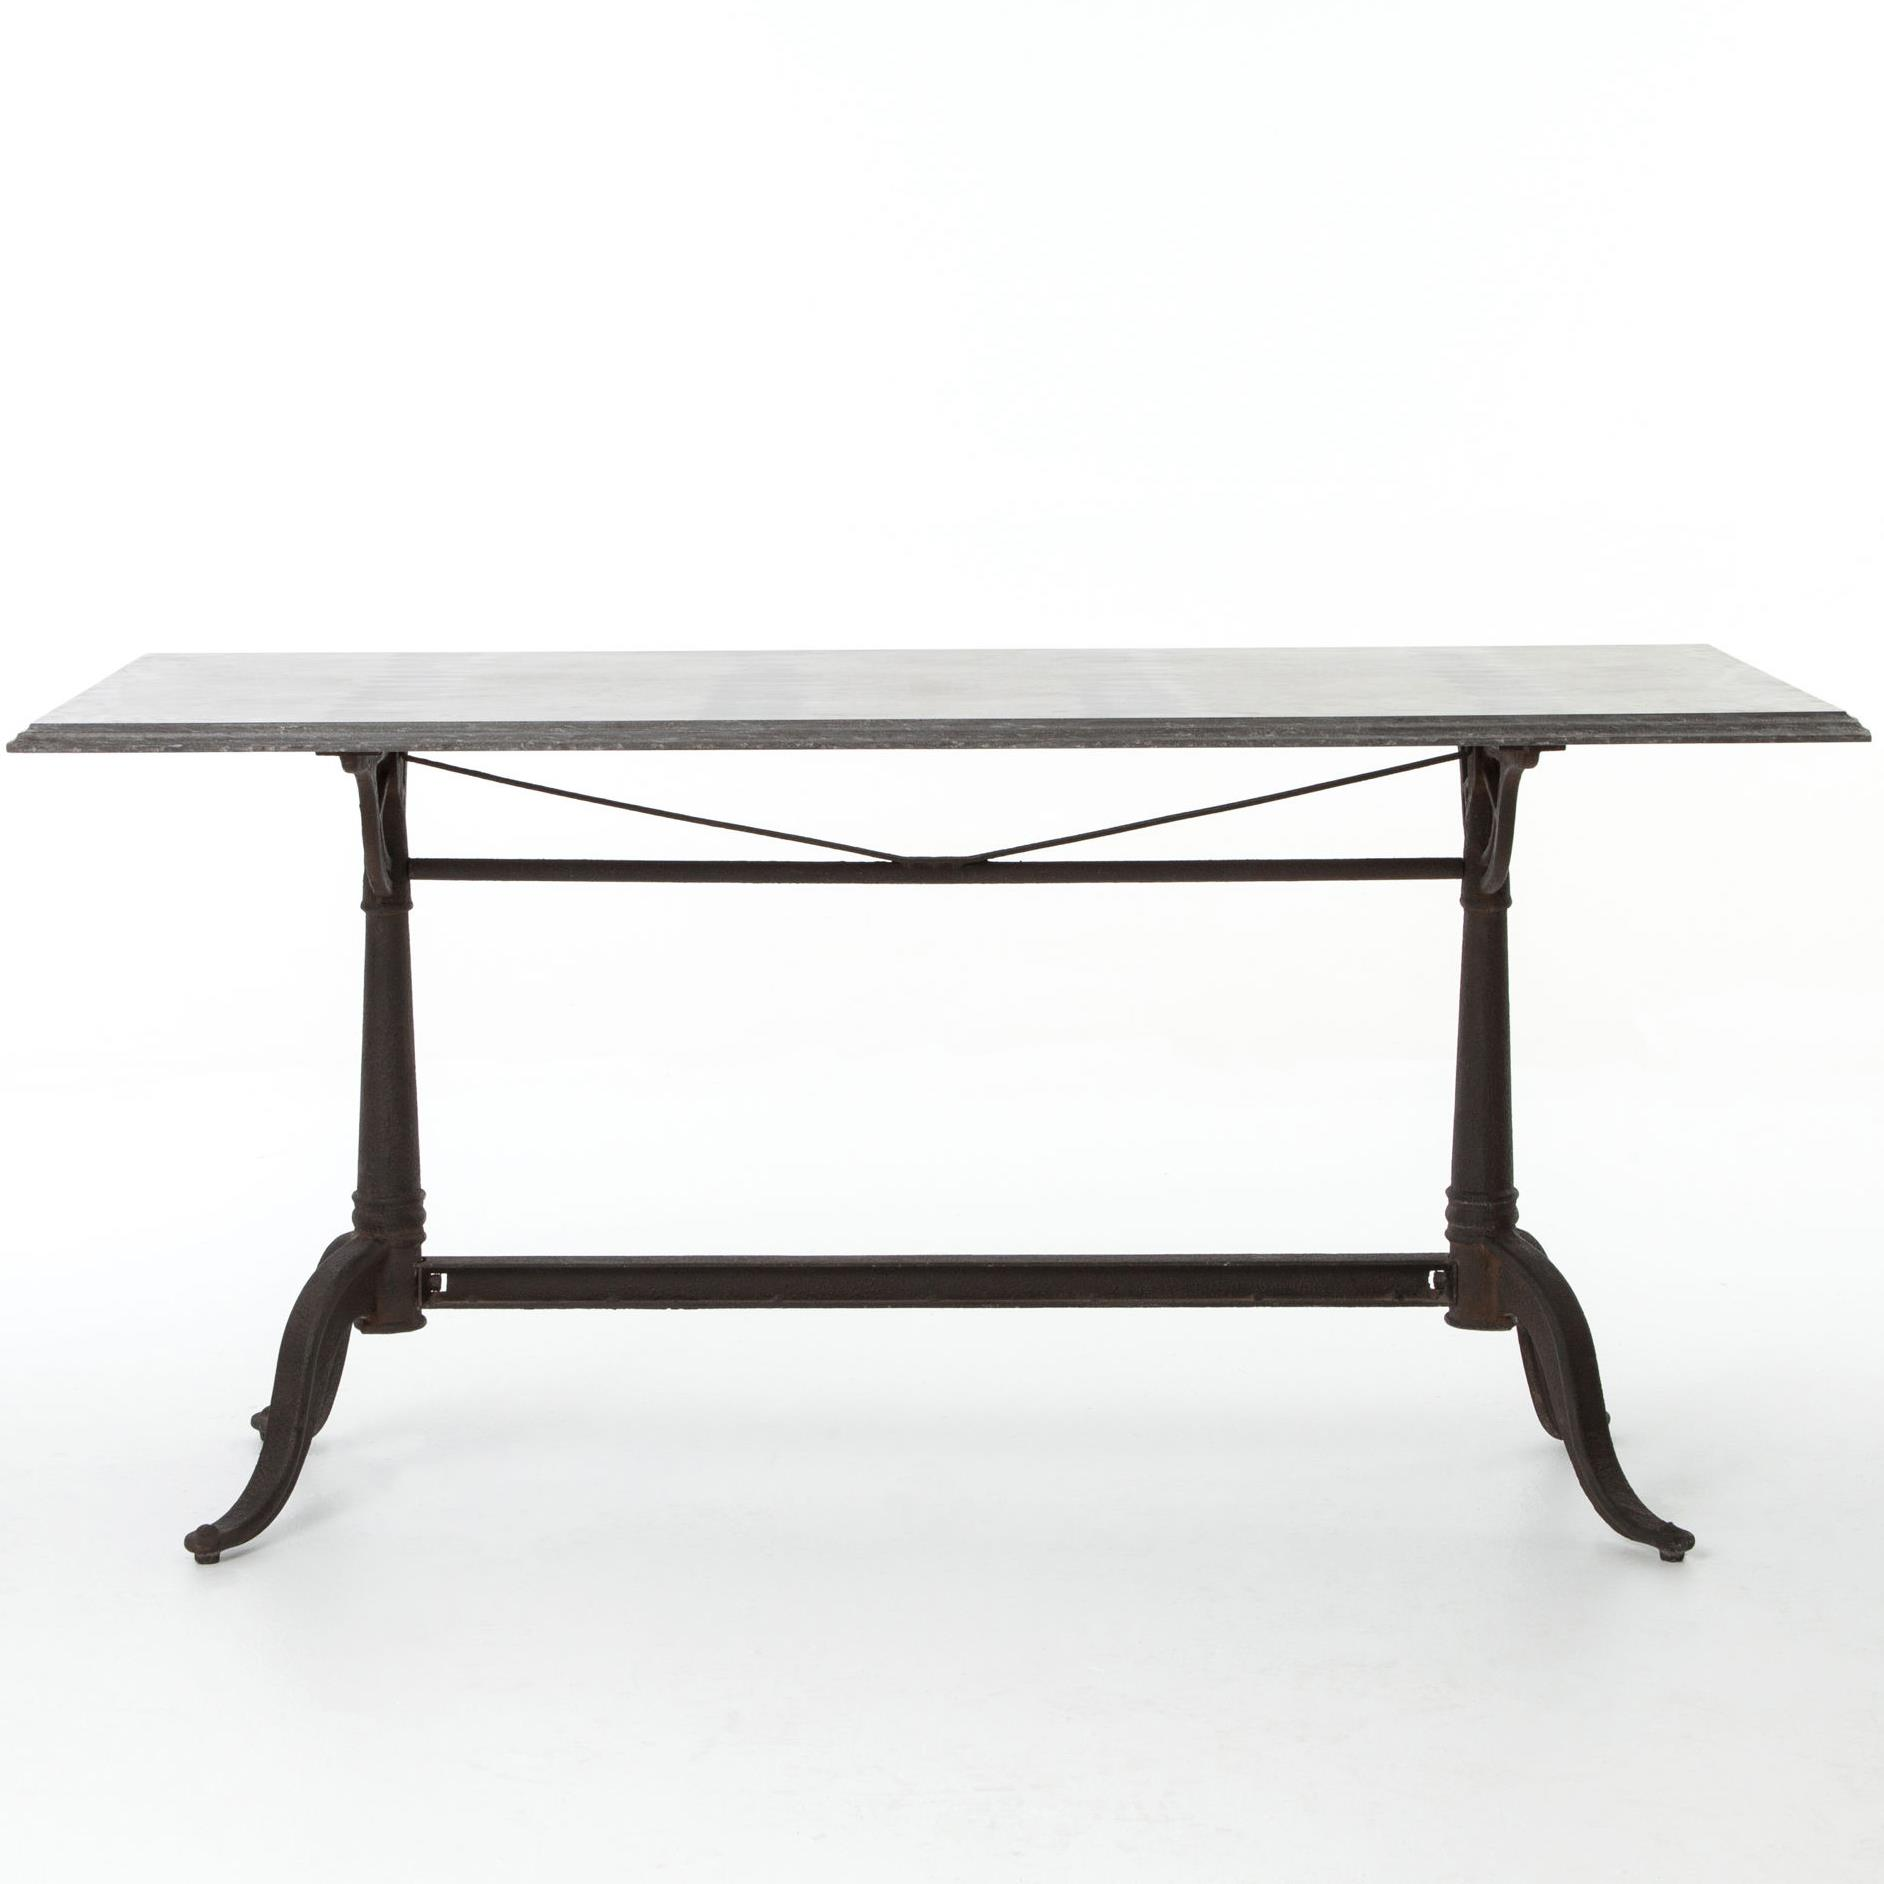 Four Hands Durham Parisian Dining Table - Item Number: CIMP-4K